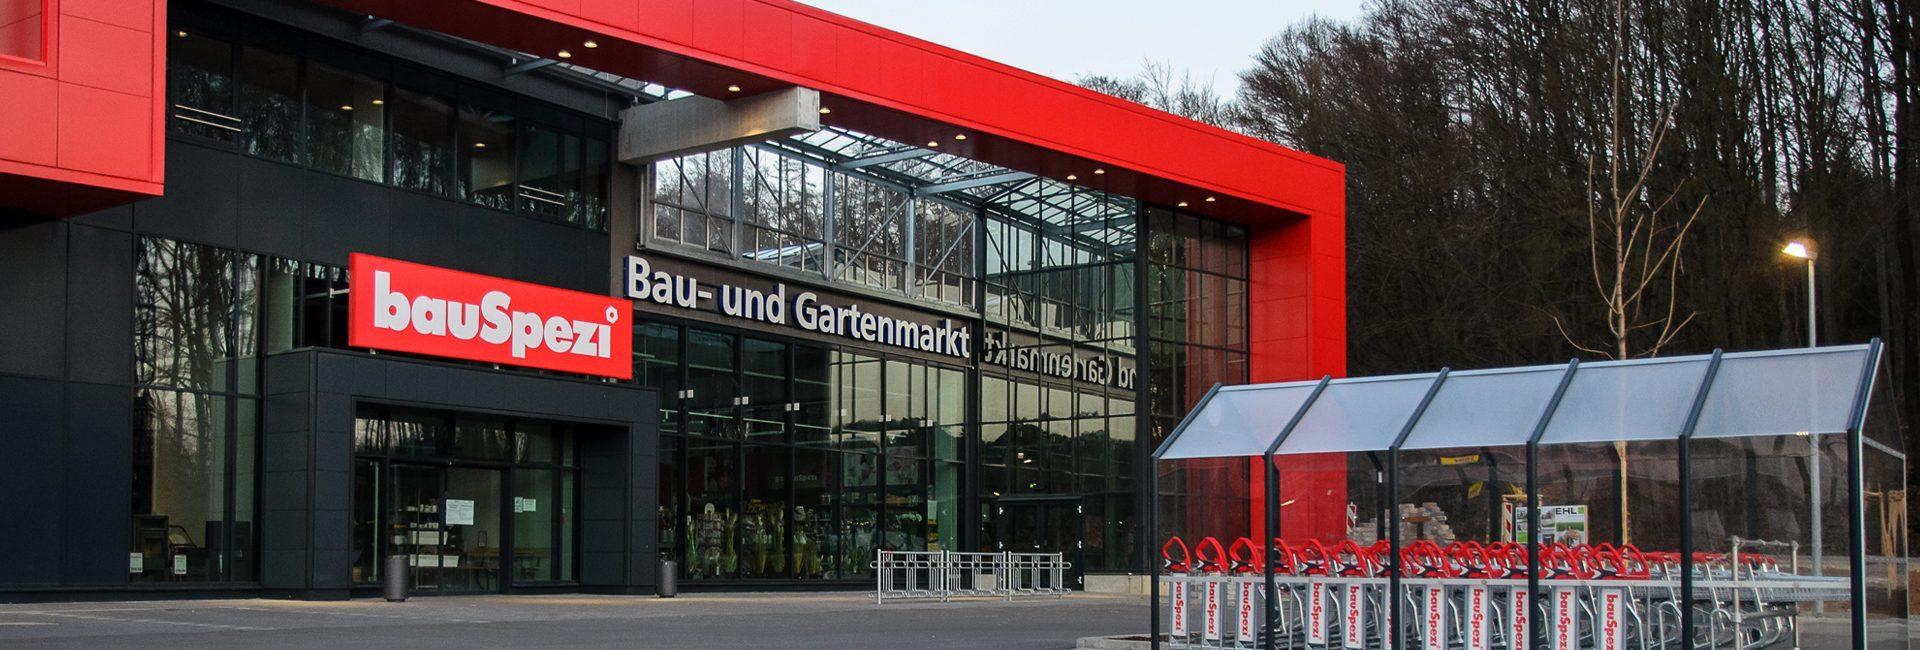 bauSpezi Baumarkt - Selbstständig - Franchising